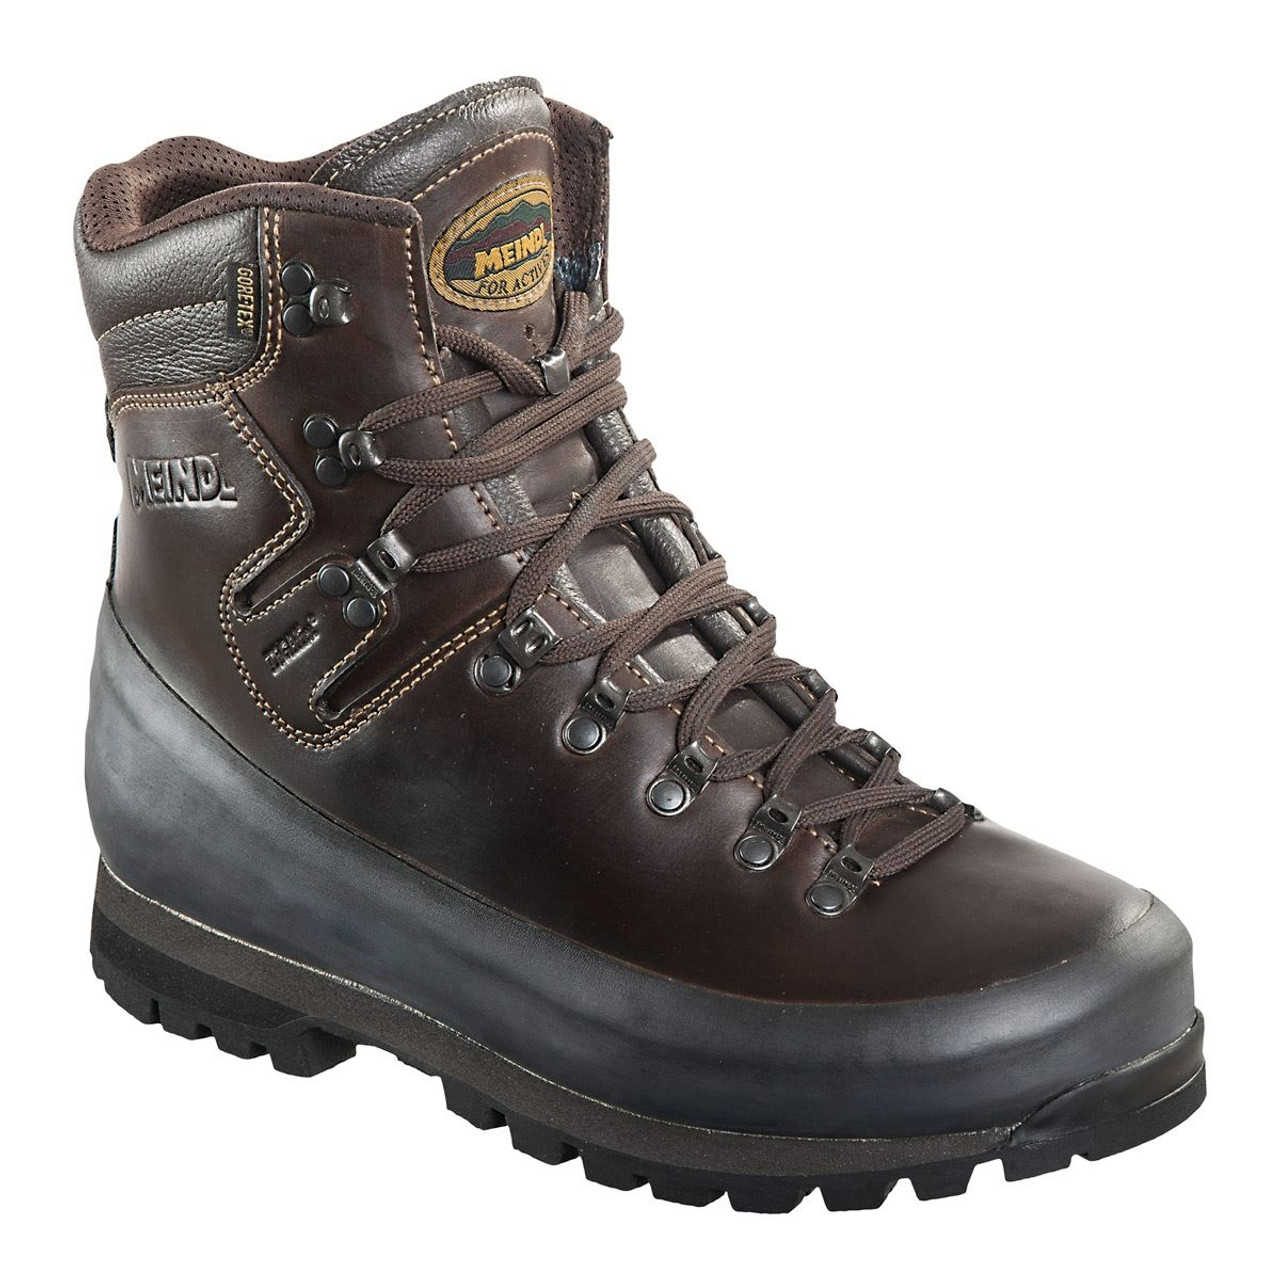 Meindl Dovre GORE-TEX Boots